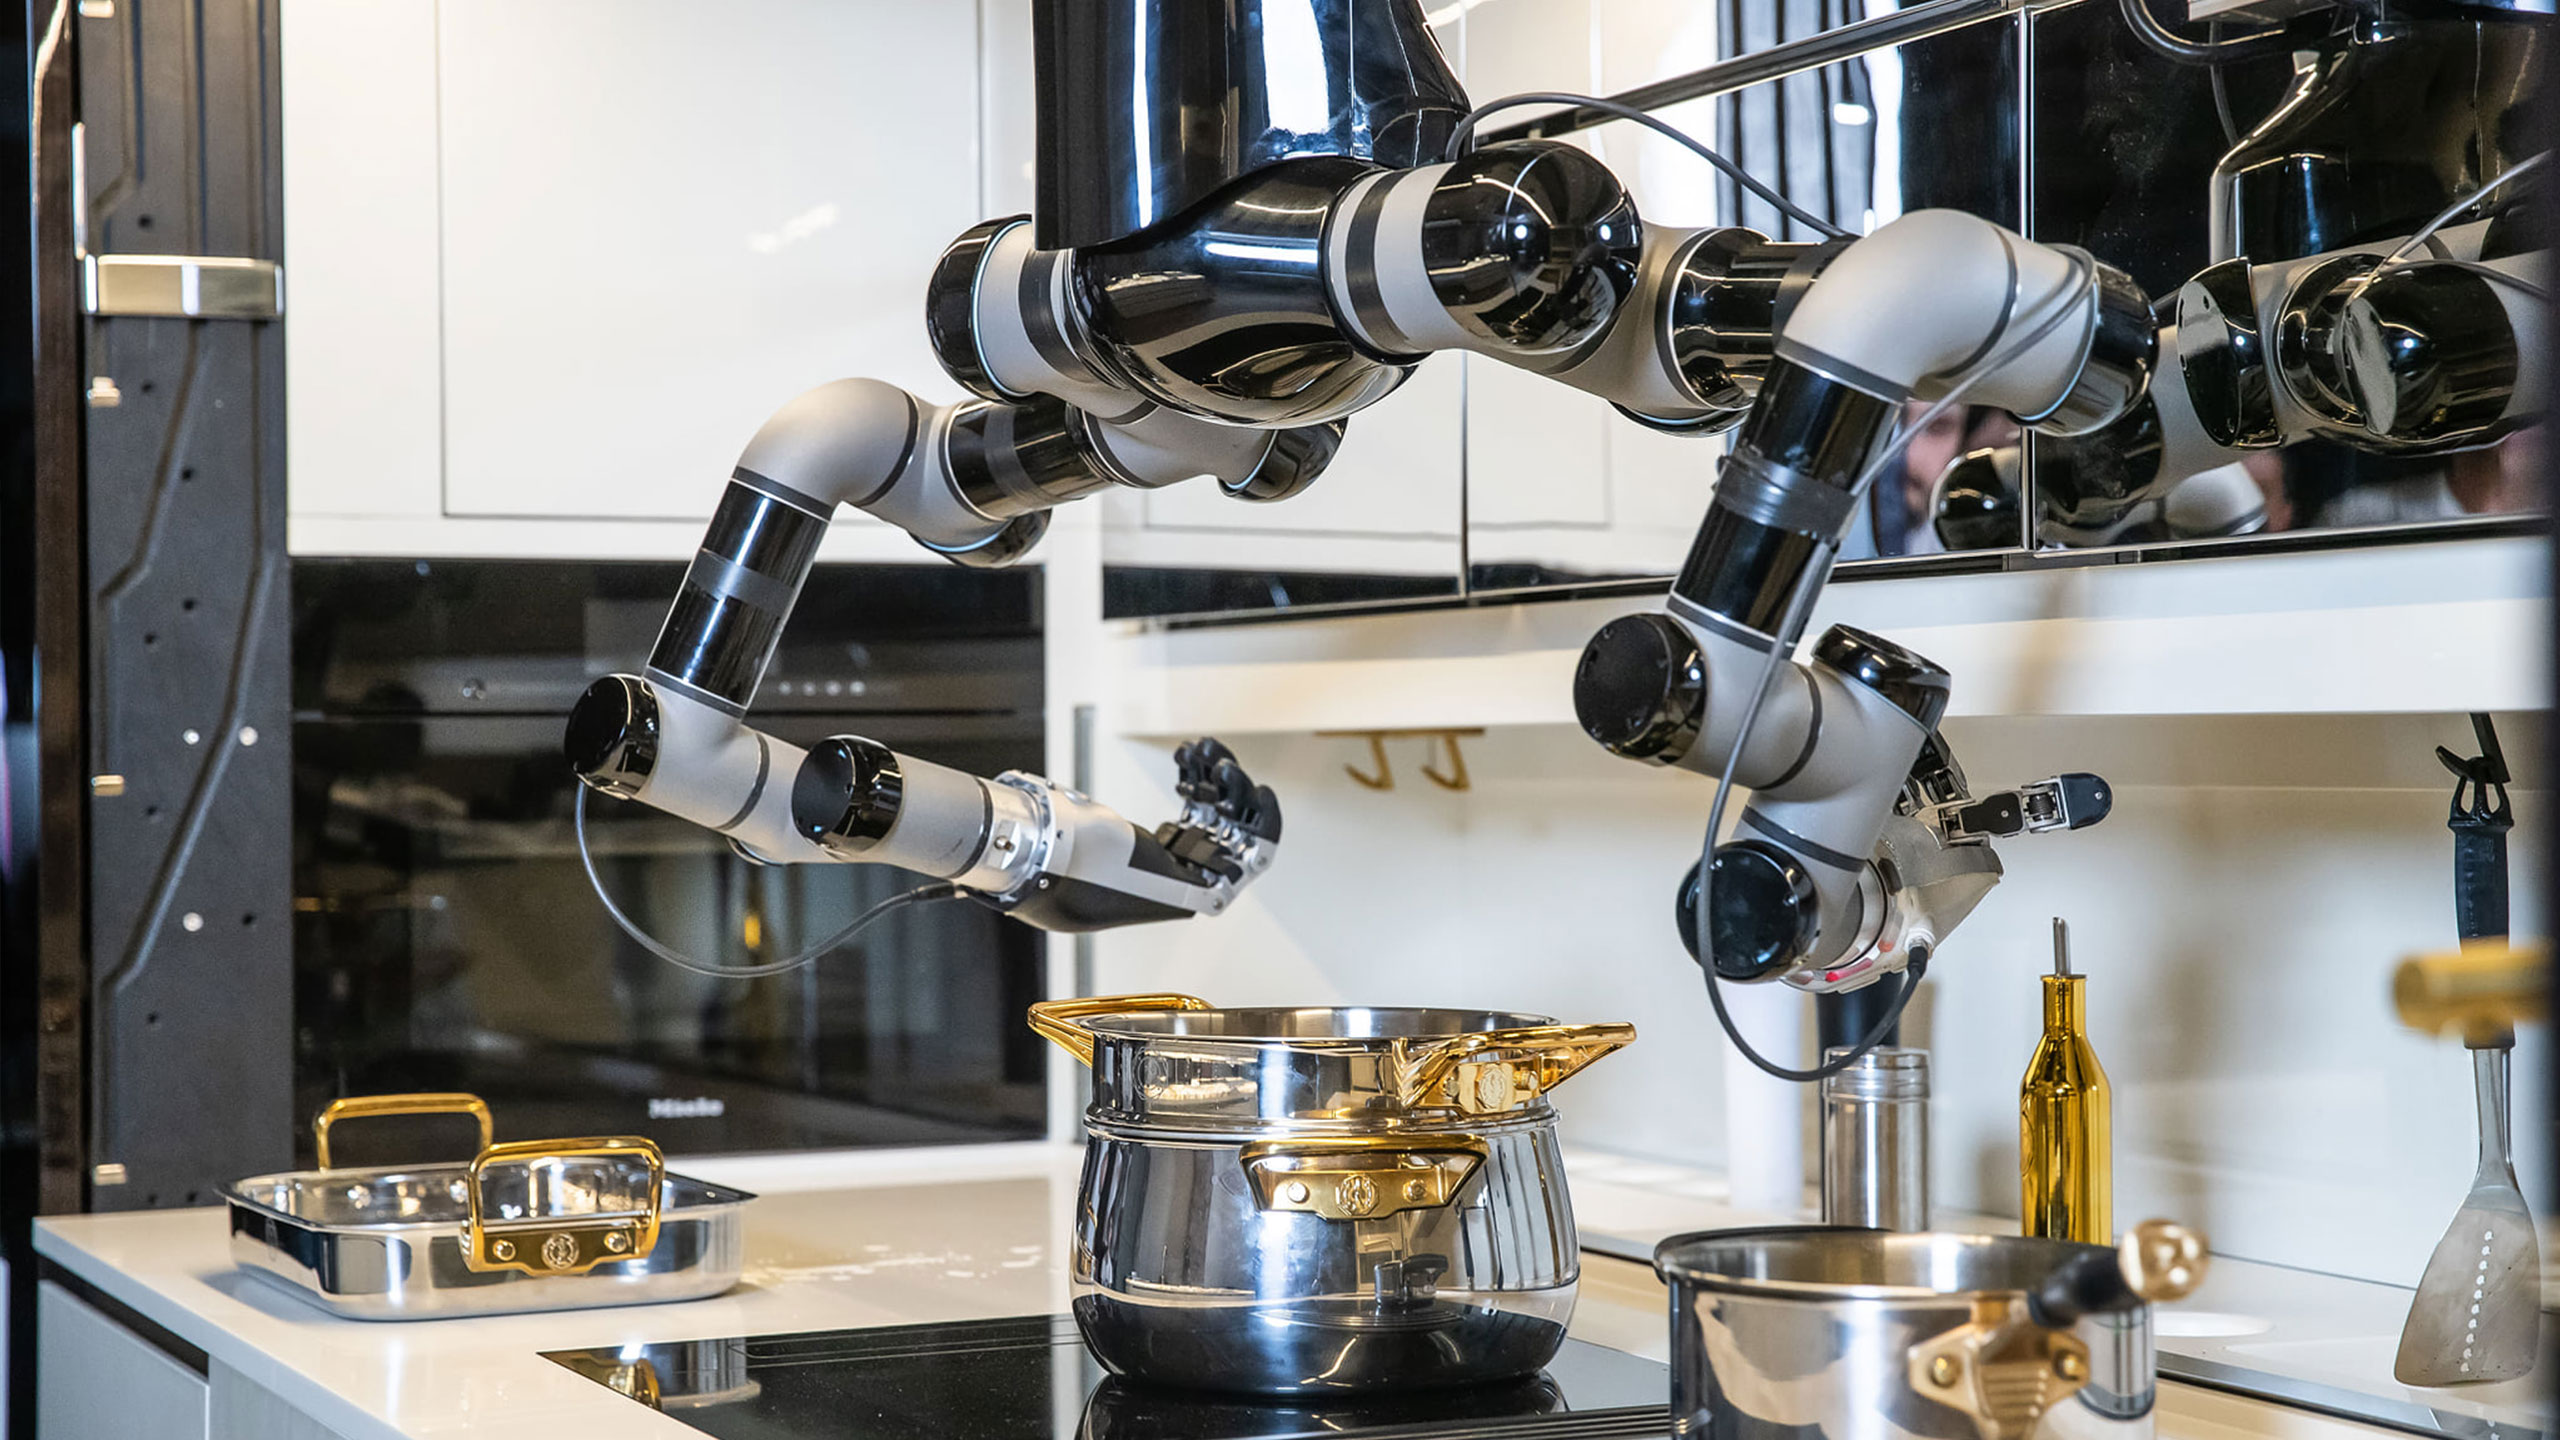 Robot-moley-kitchen